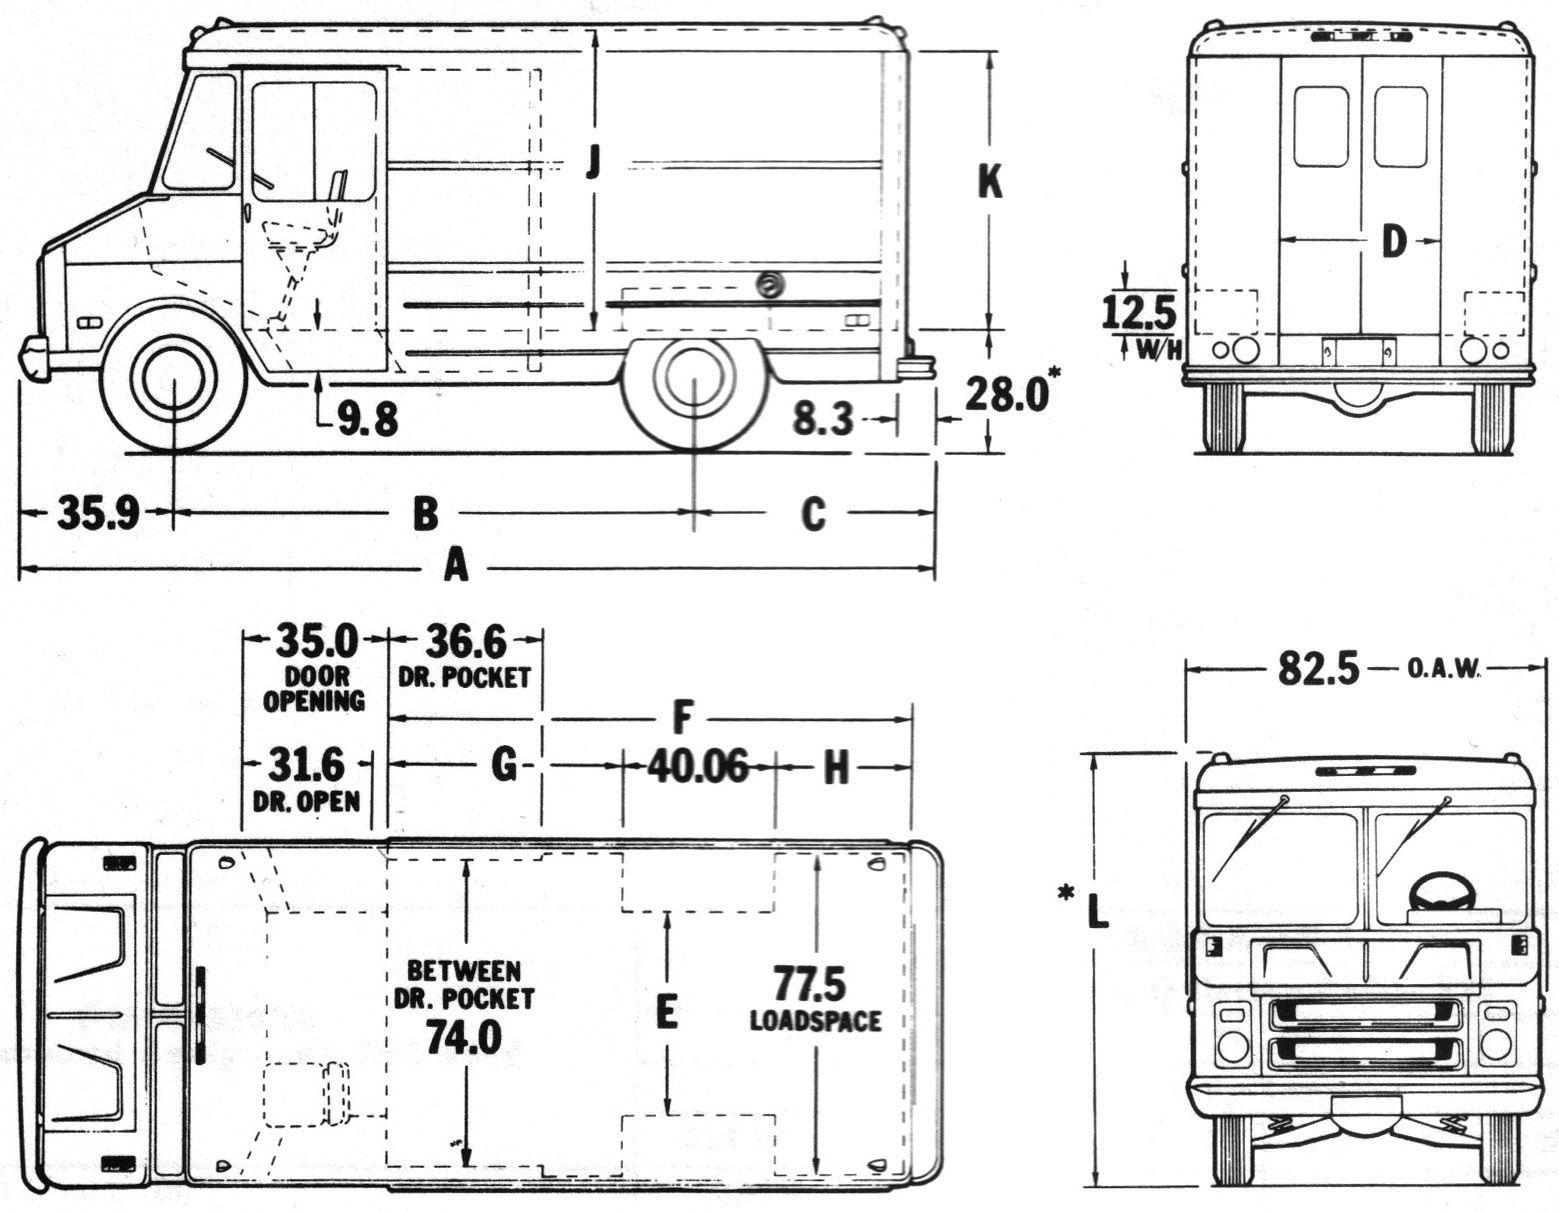 chevrolet c30 blueprint [ 1559 x 1212 Pixel ]